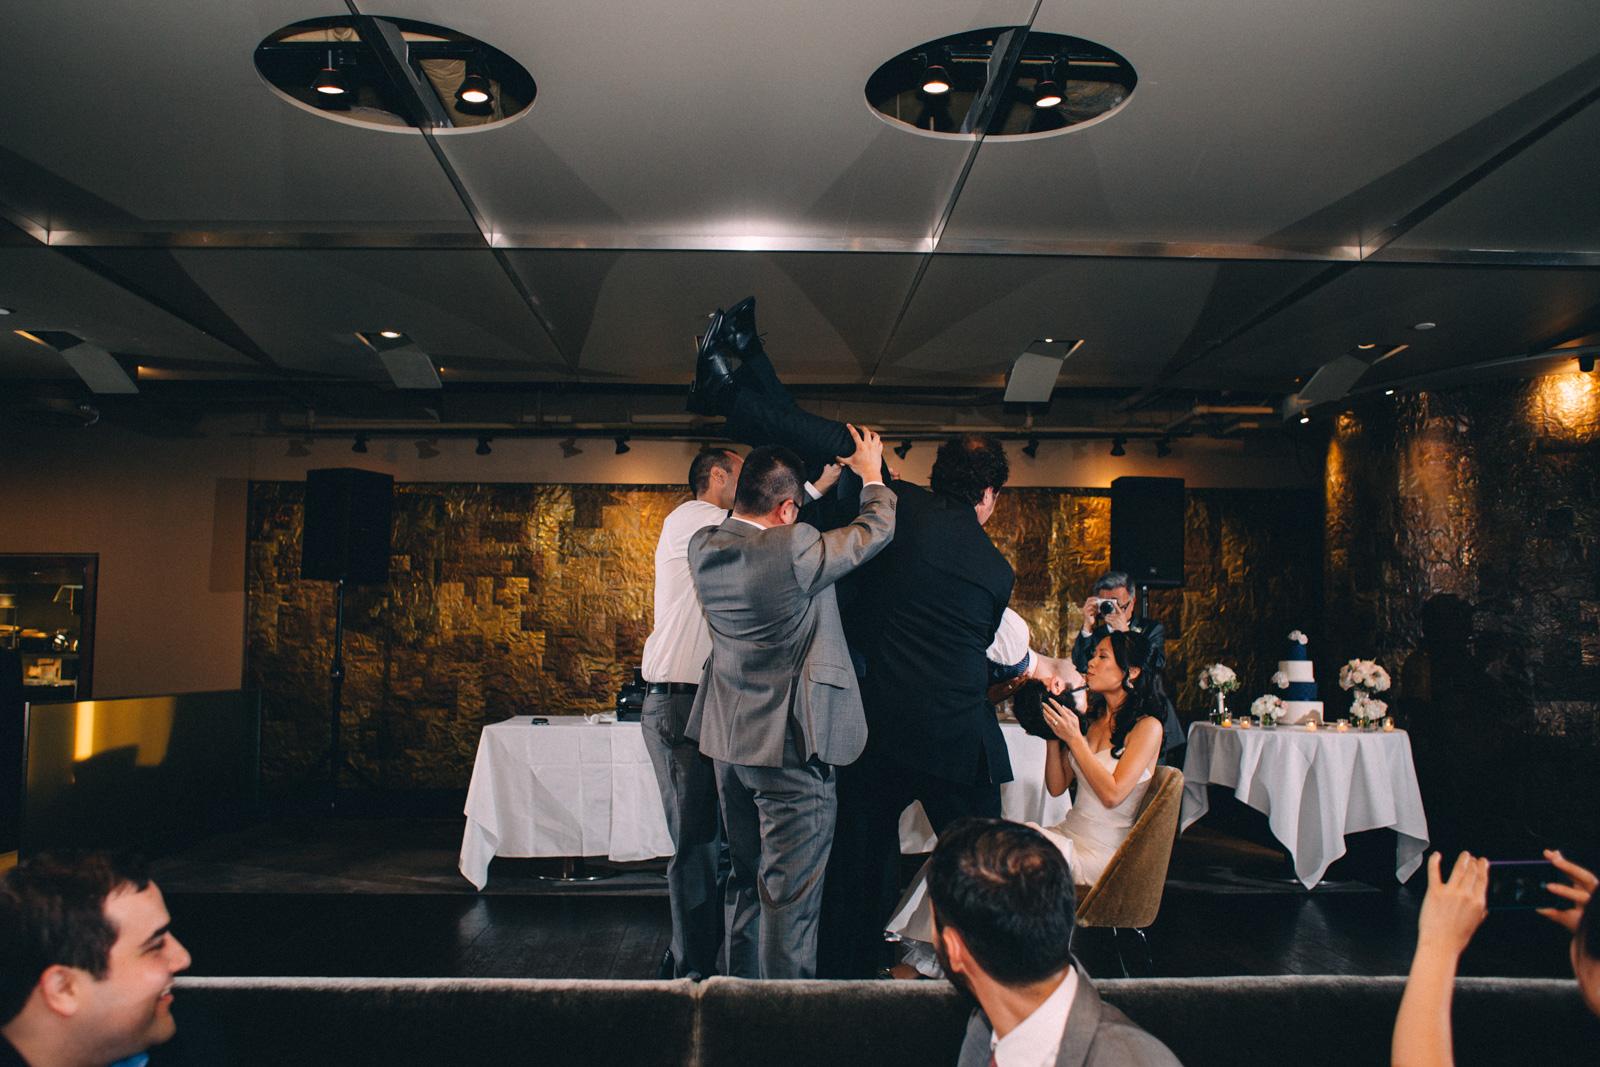 Canoe-Toronto-wedding-photography-JM-by-Sam-Wong-of-visual-cravings_48